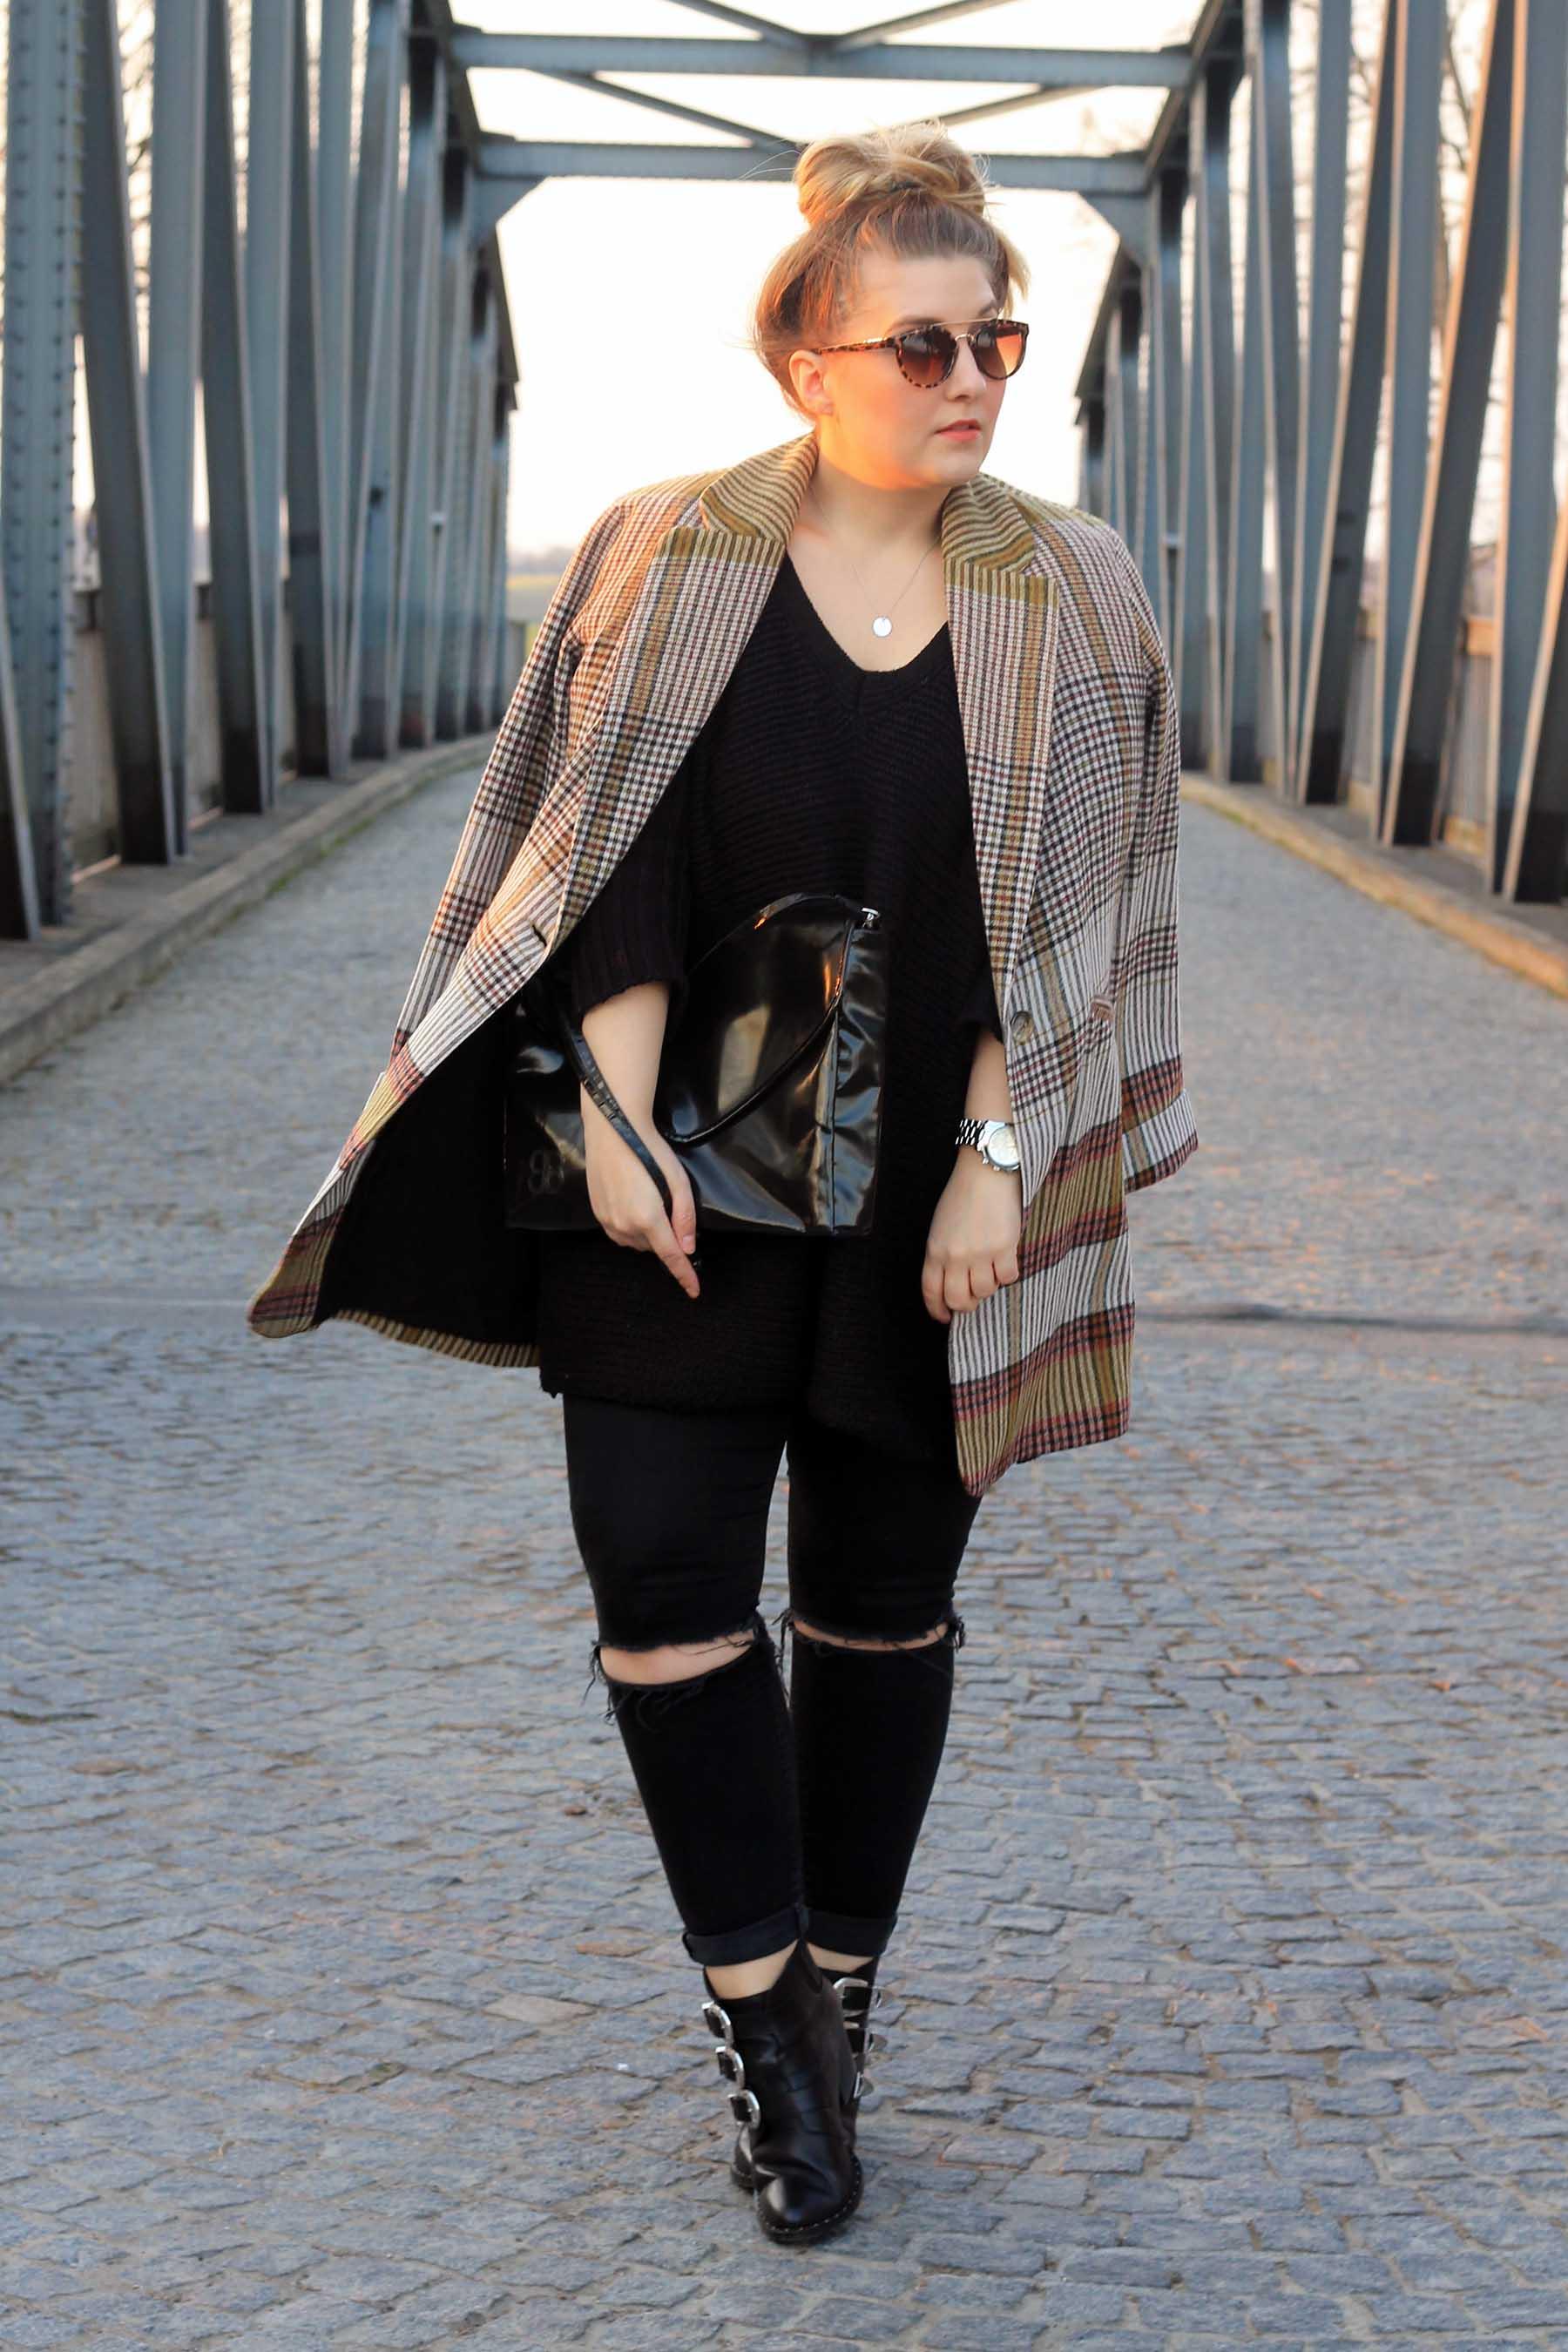 outfit-modeblog-berlin-hamburg-top-blogger-karierter-mantel